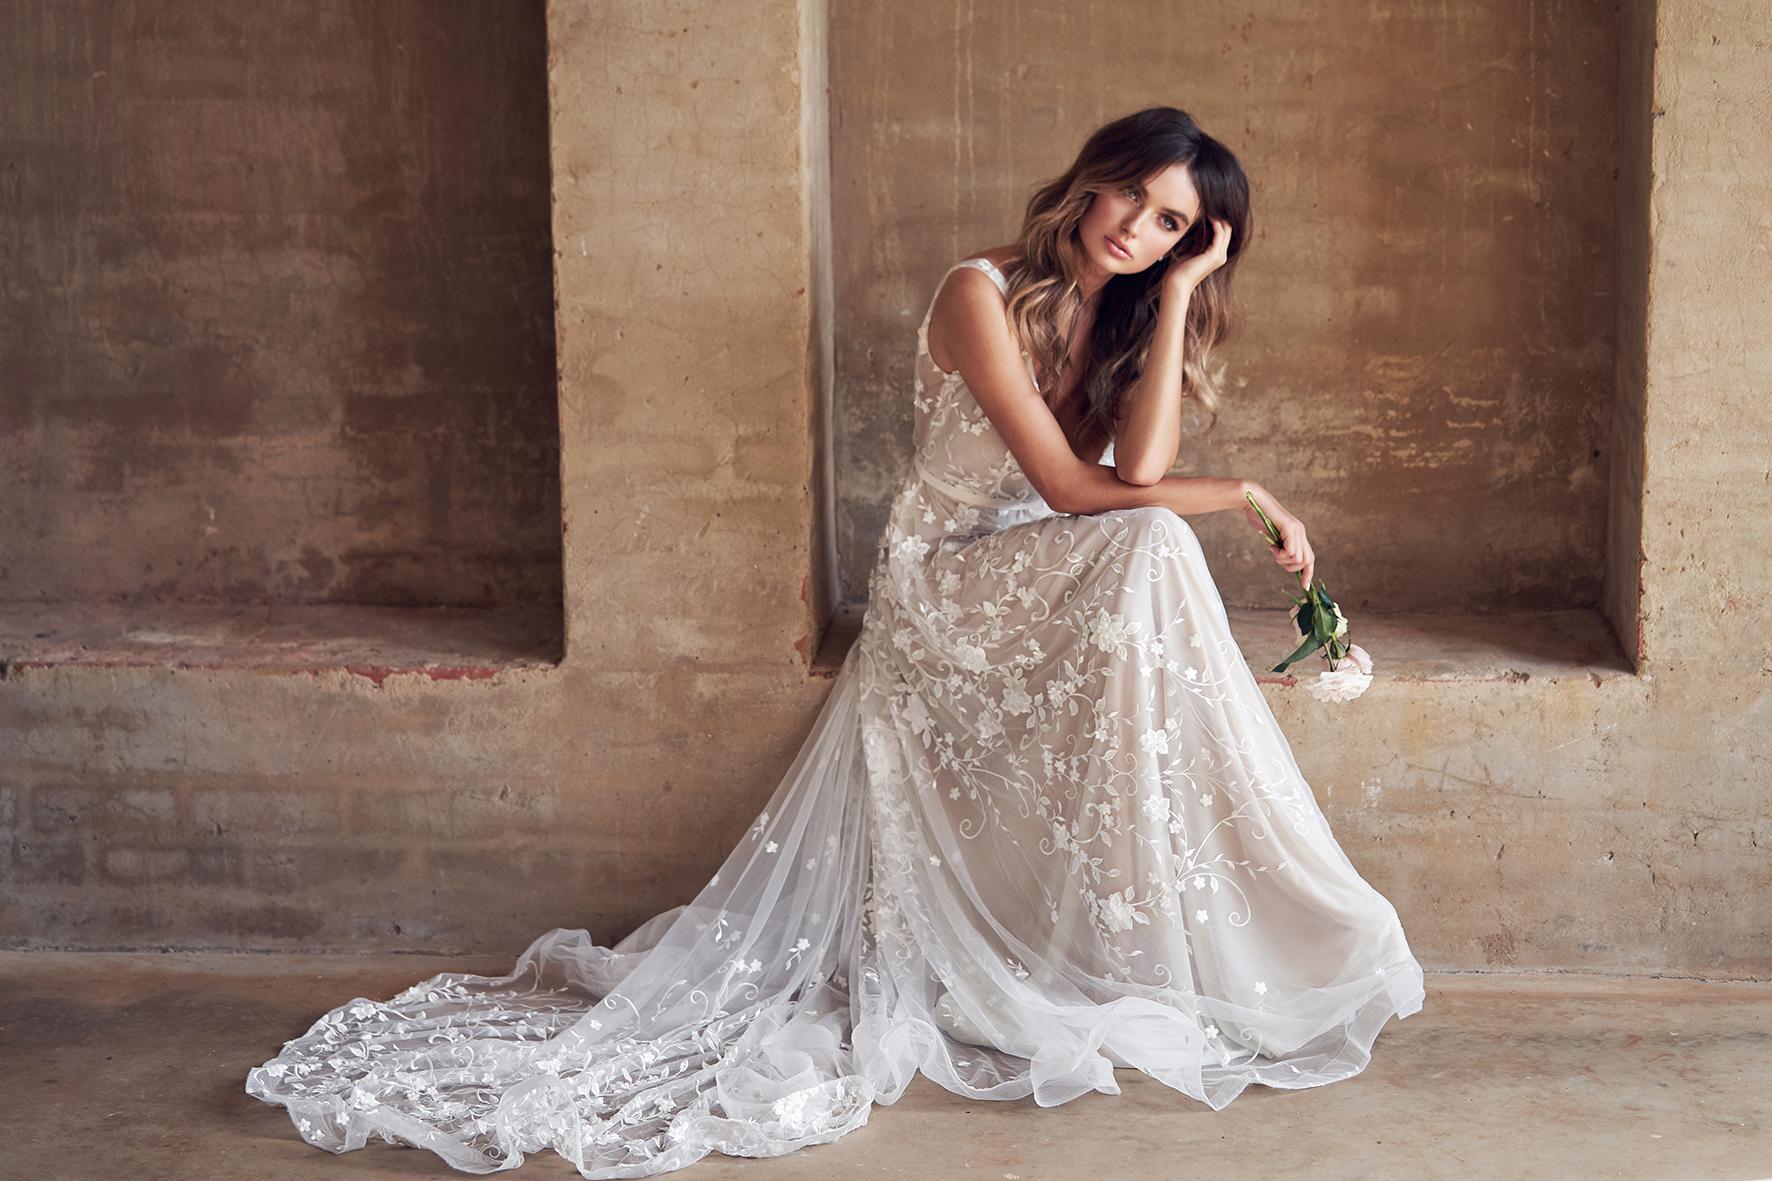 Anna Campbell's 2019 Gossamer Wedding Dress Collection forecast